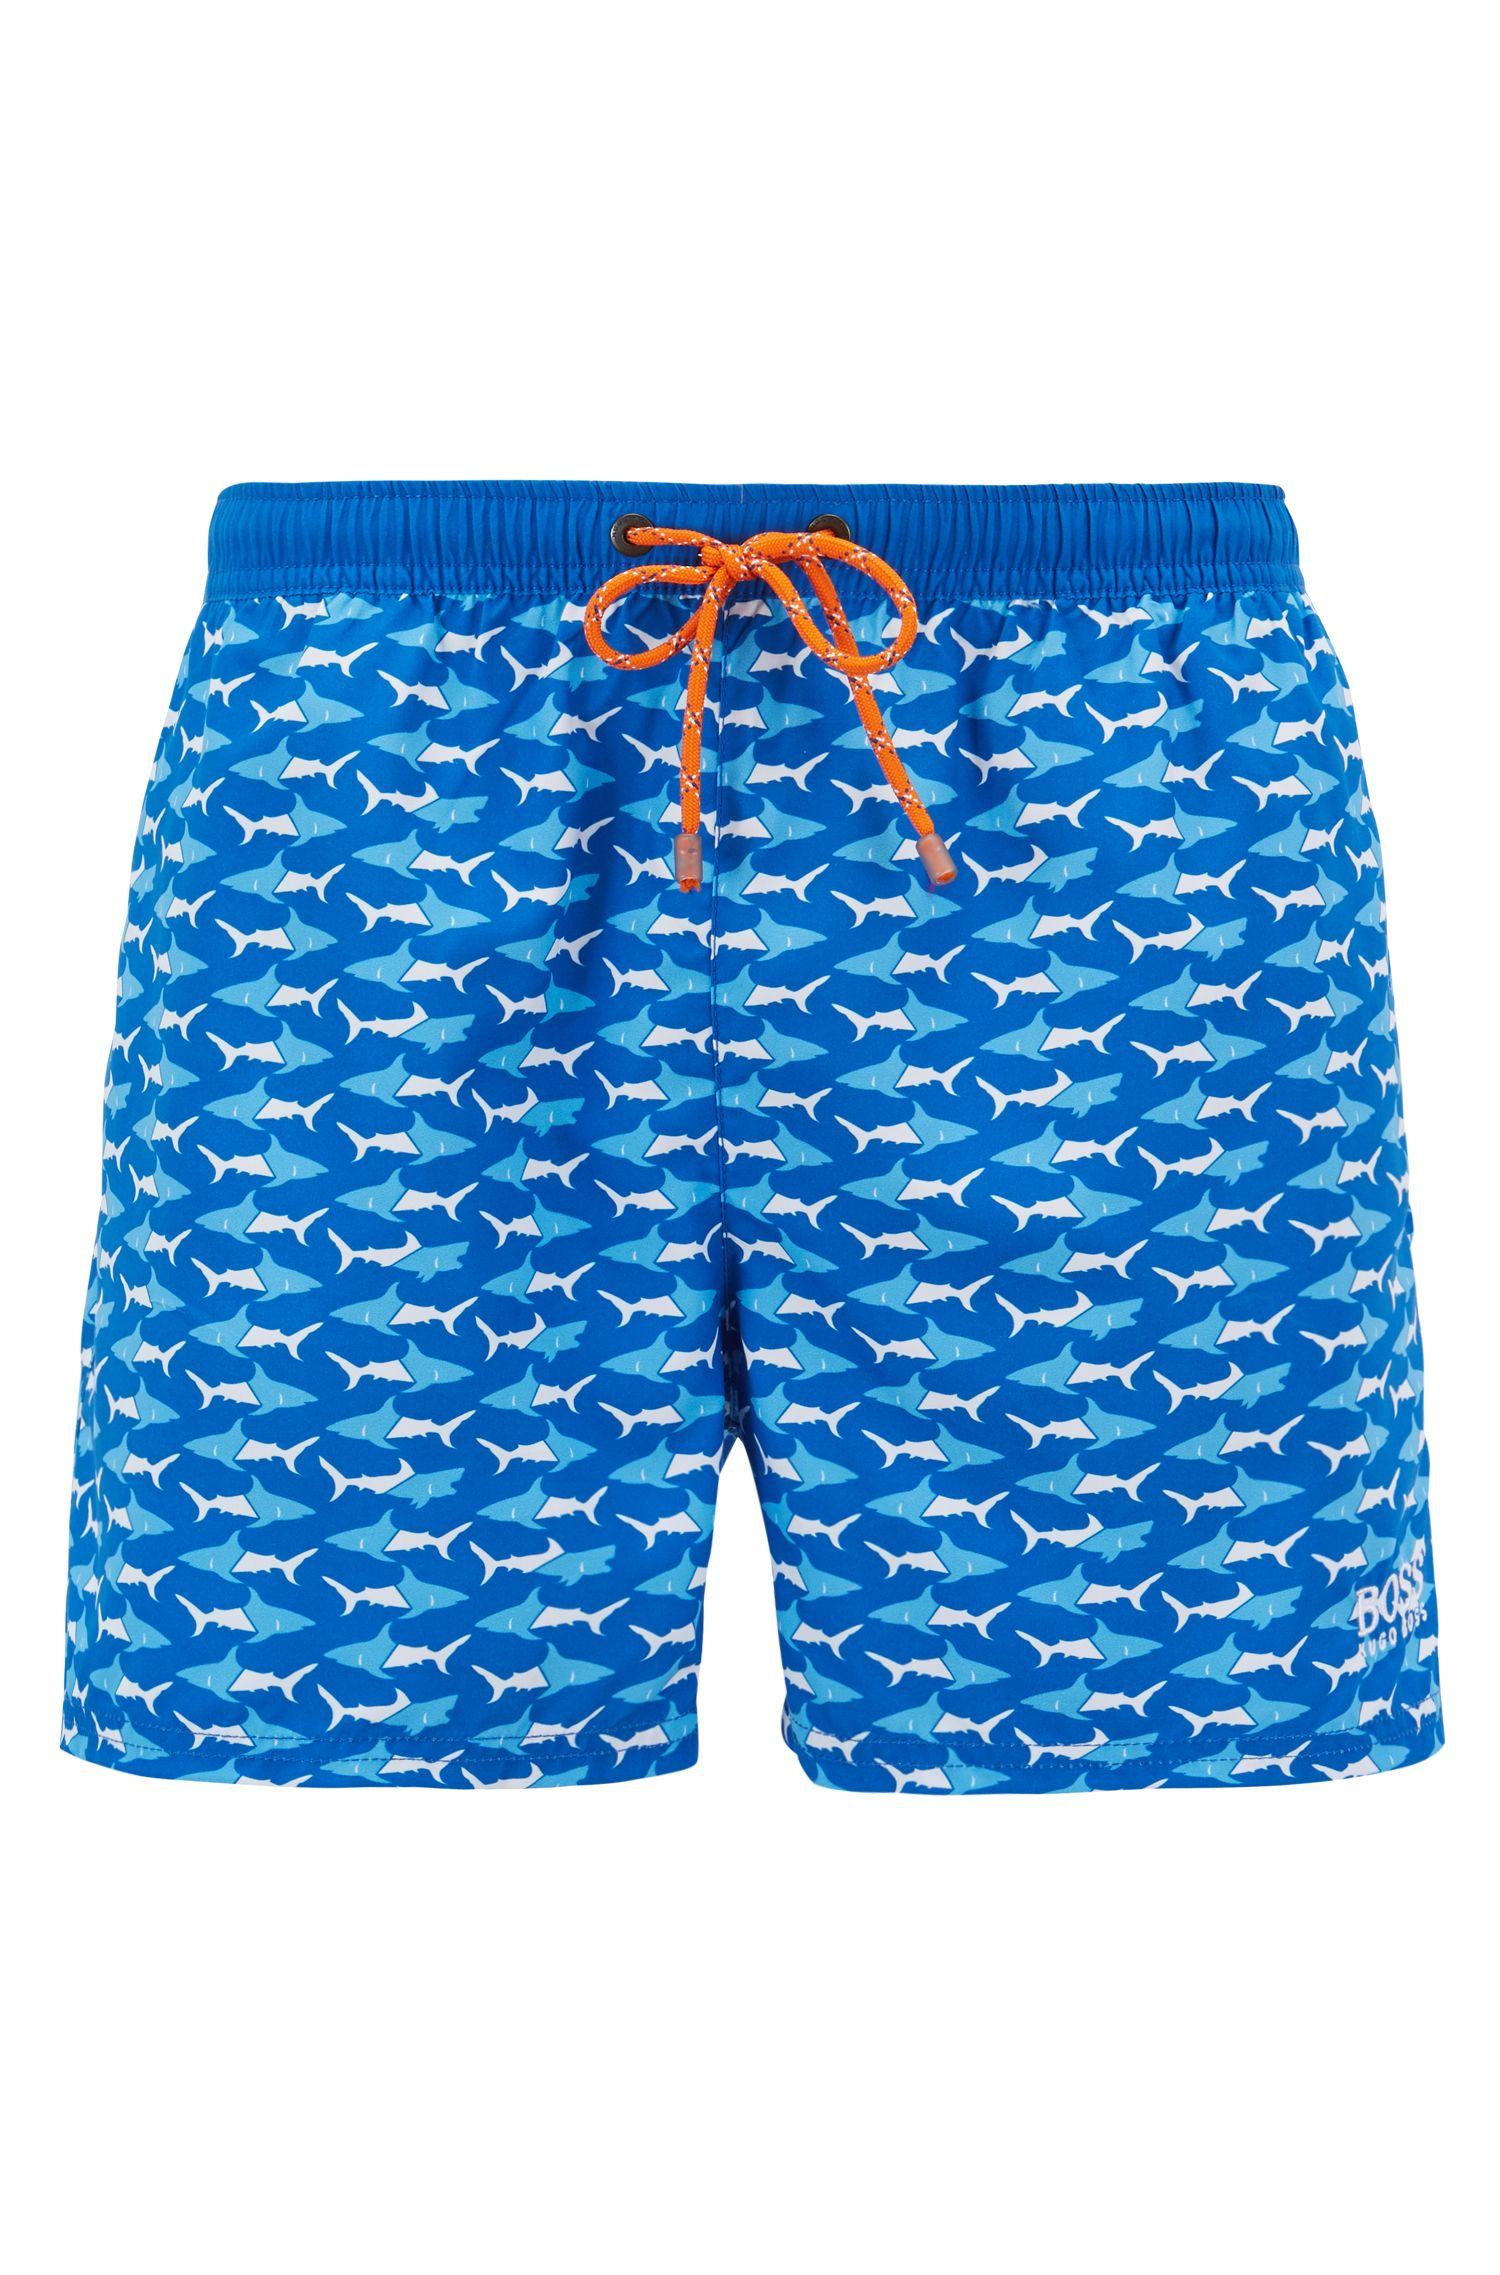 Shorter-length swim shorts with sea-life print, Blue